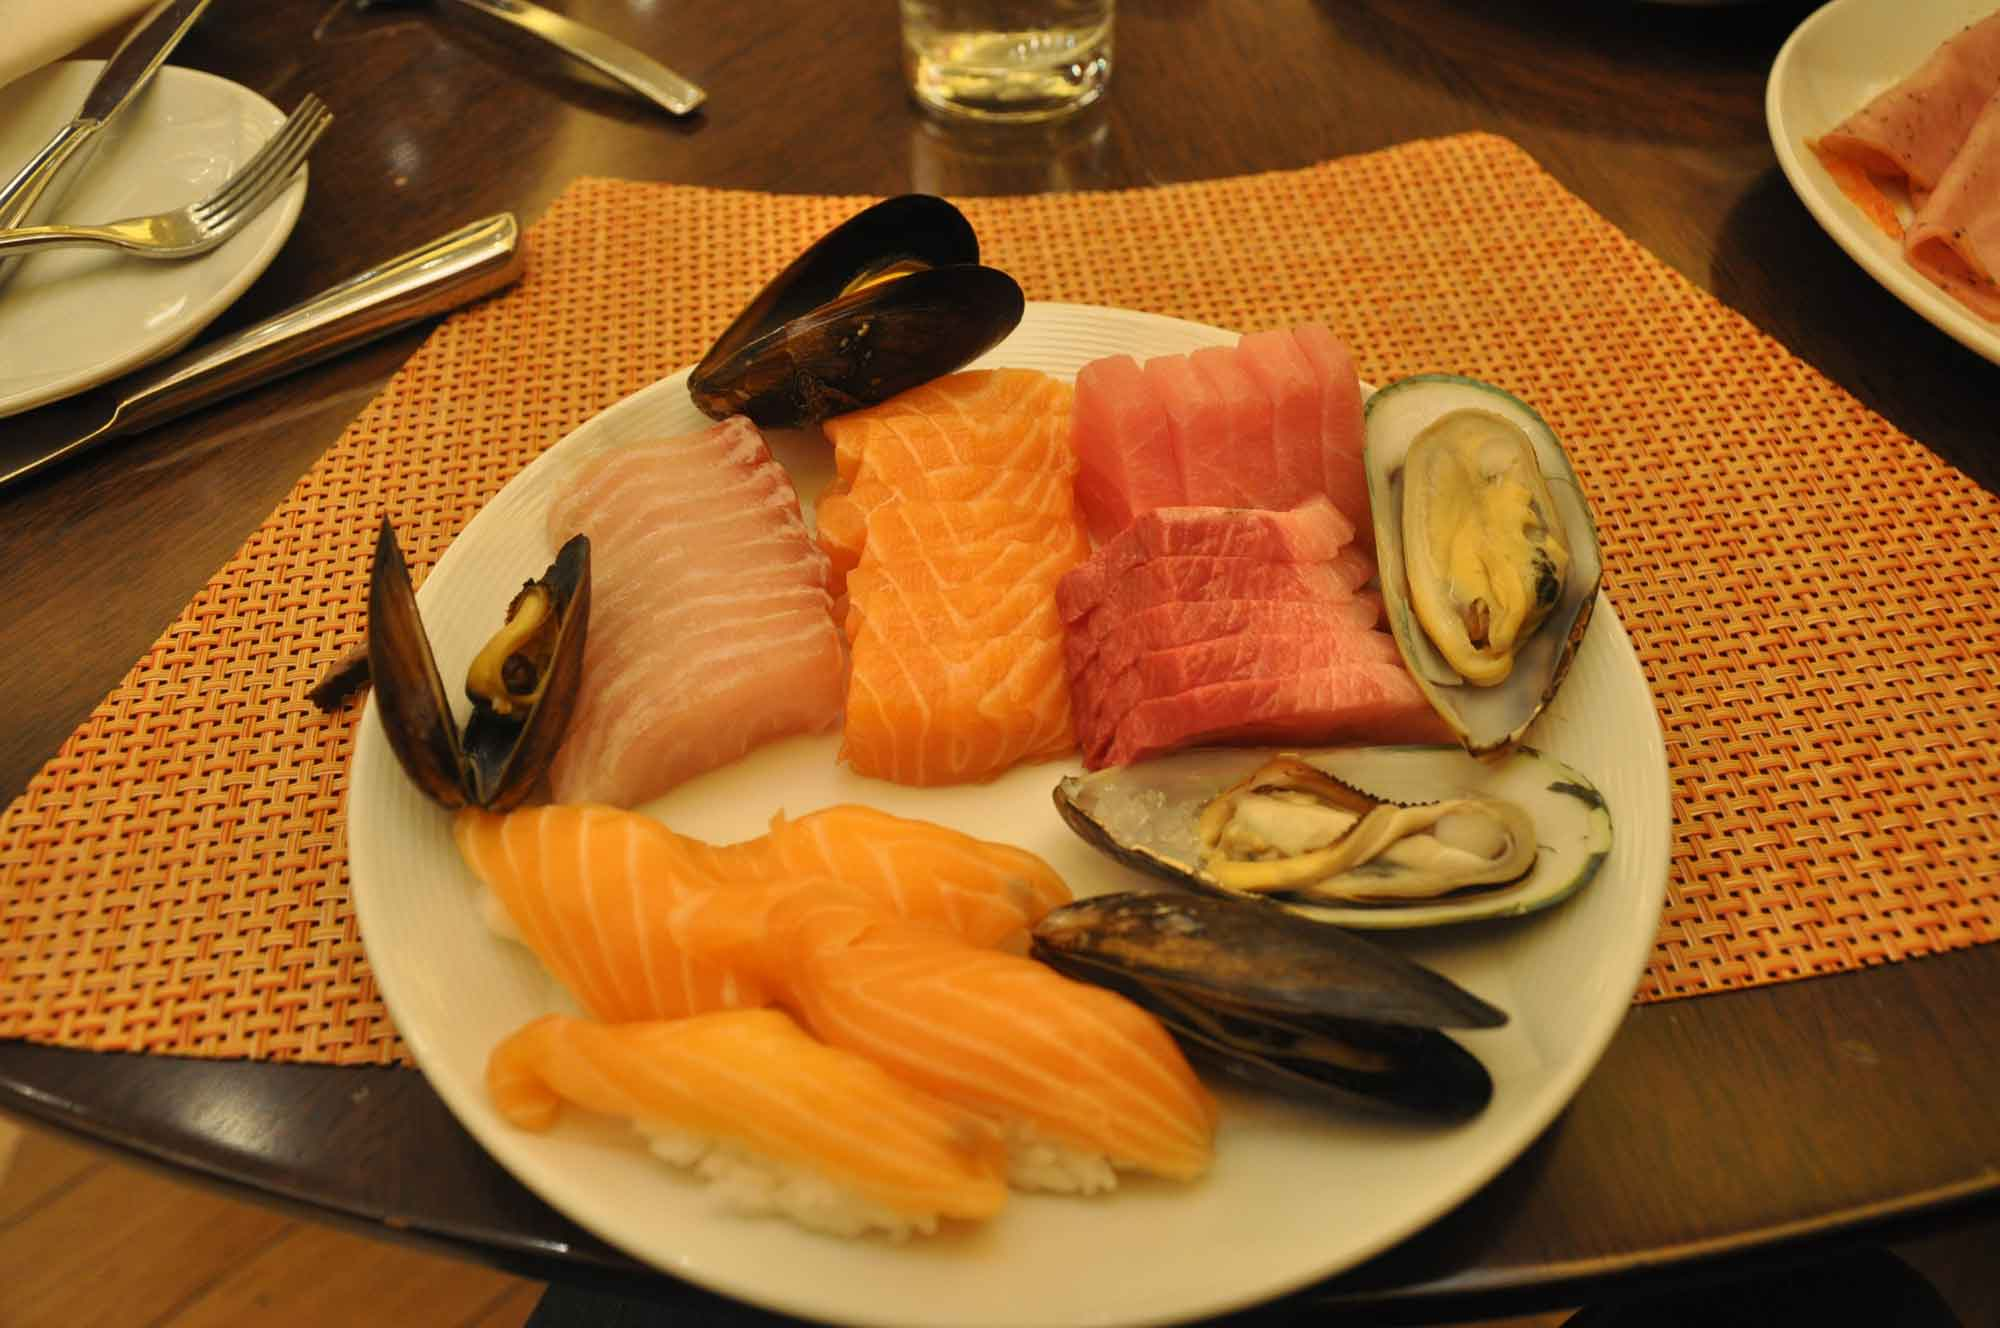 Grand Orbit Macau sashimi and oysters